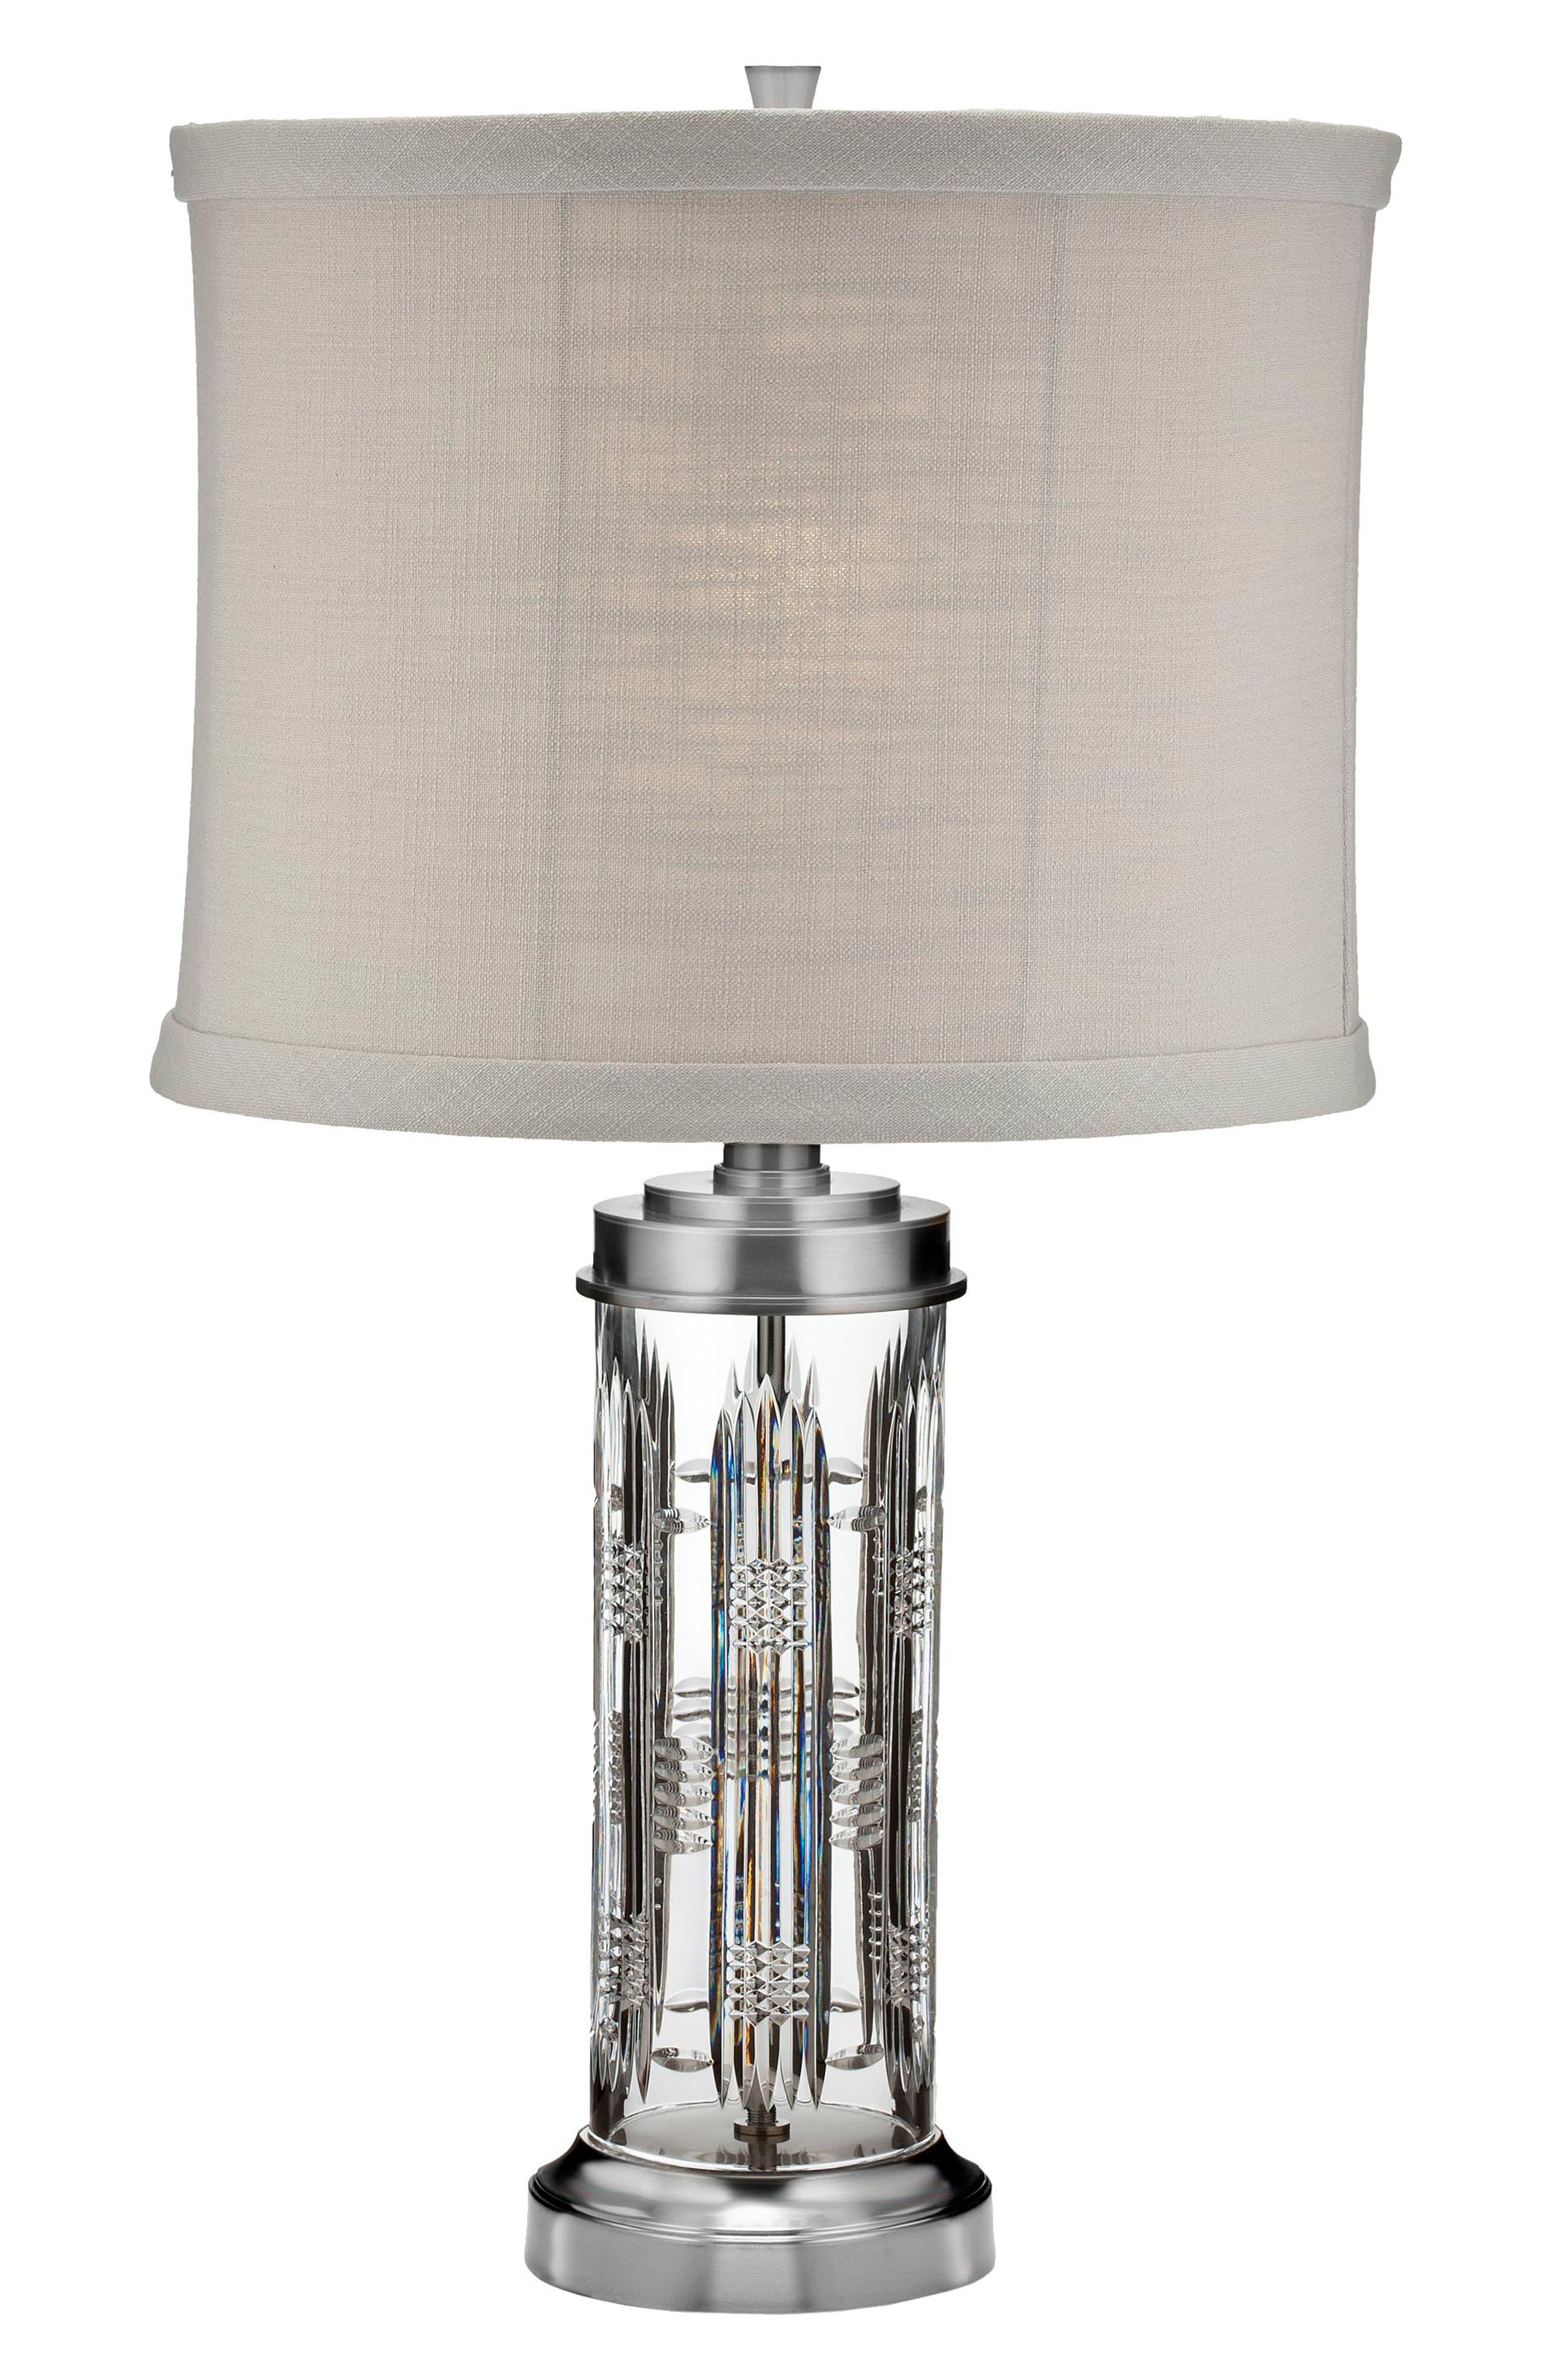 Main Image - Waterford Dungarvan Lead Crystal Chrome Table Lamp